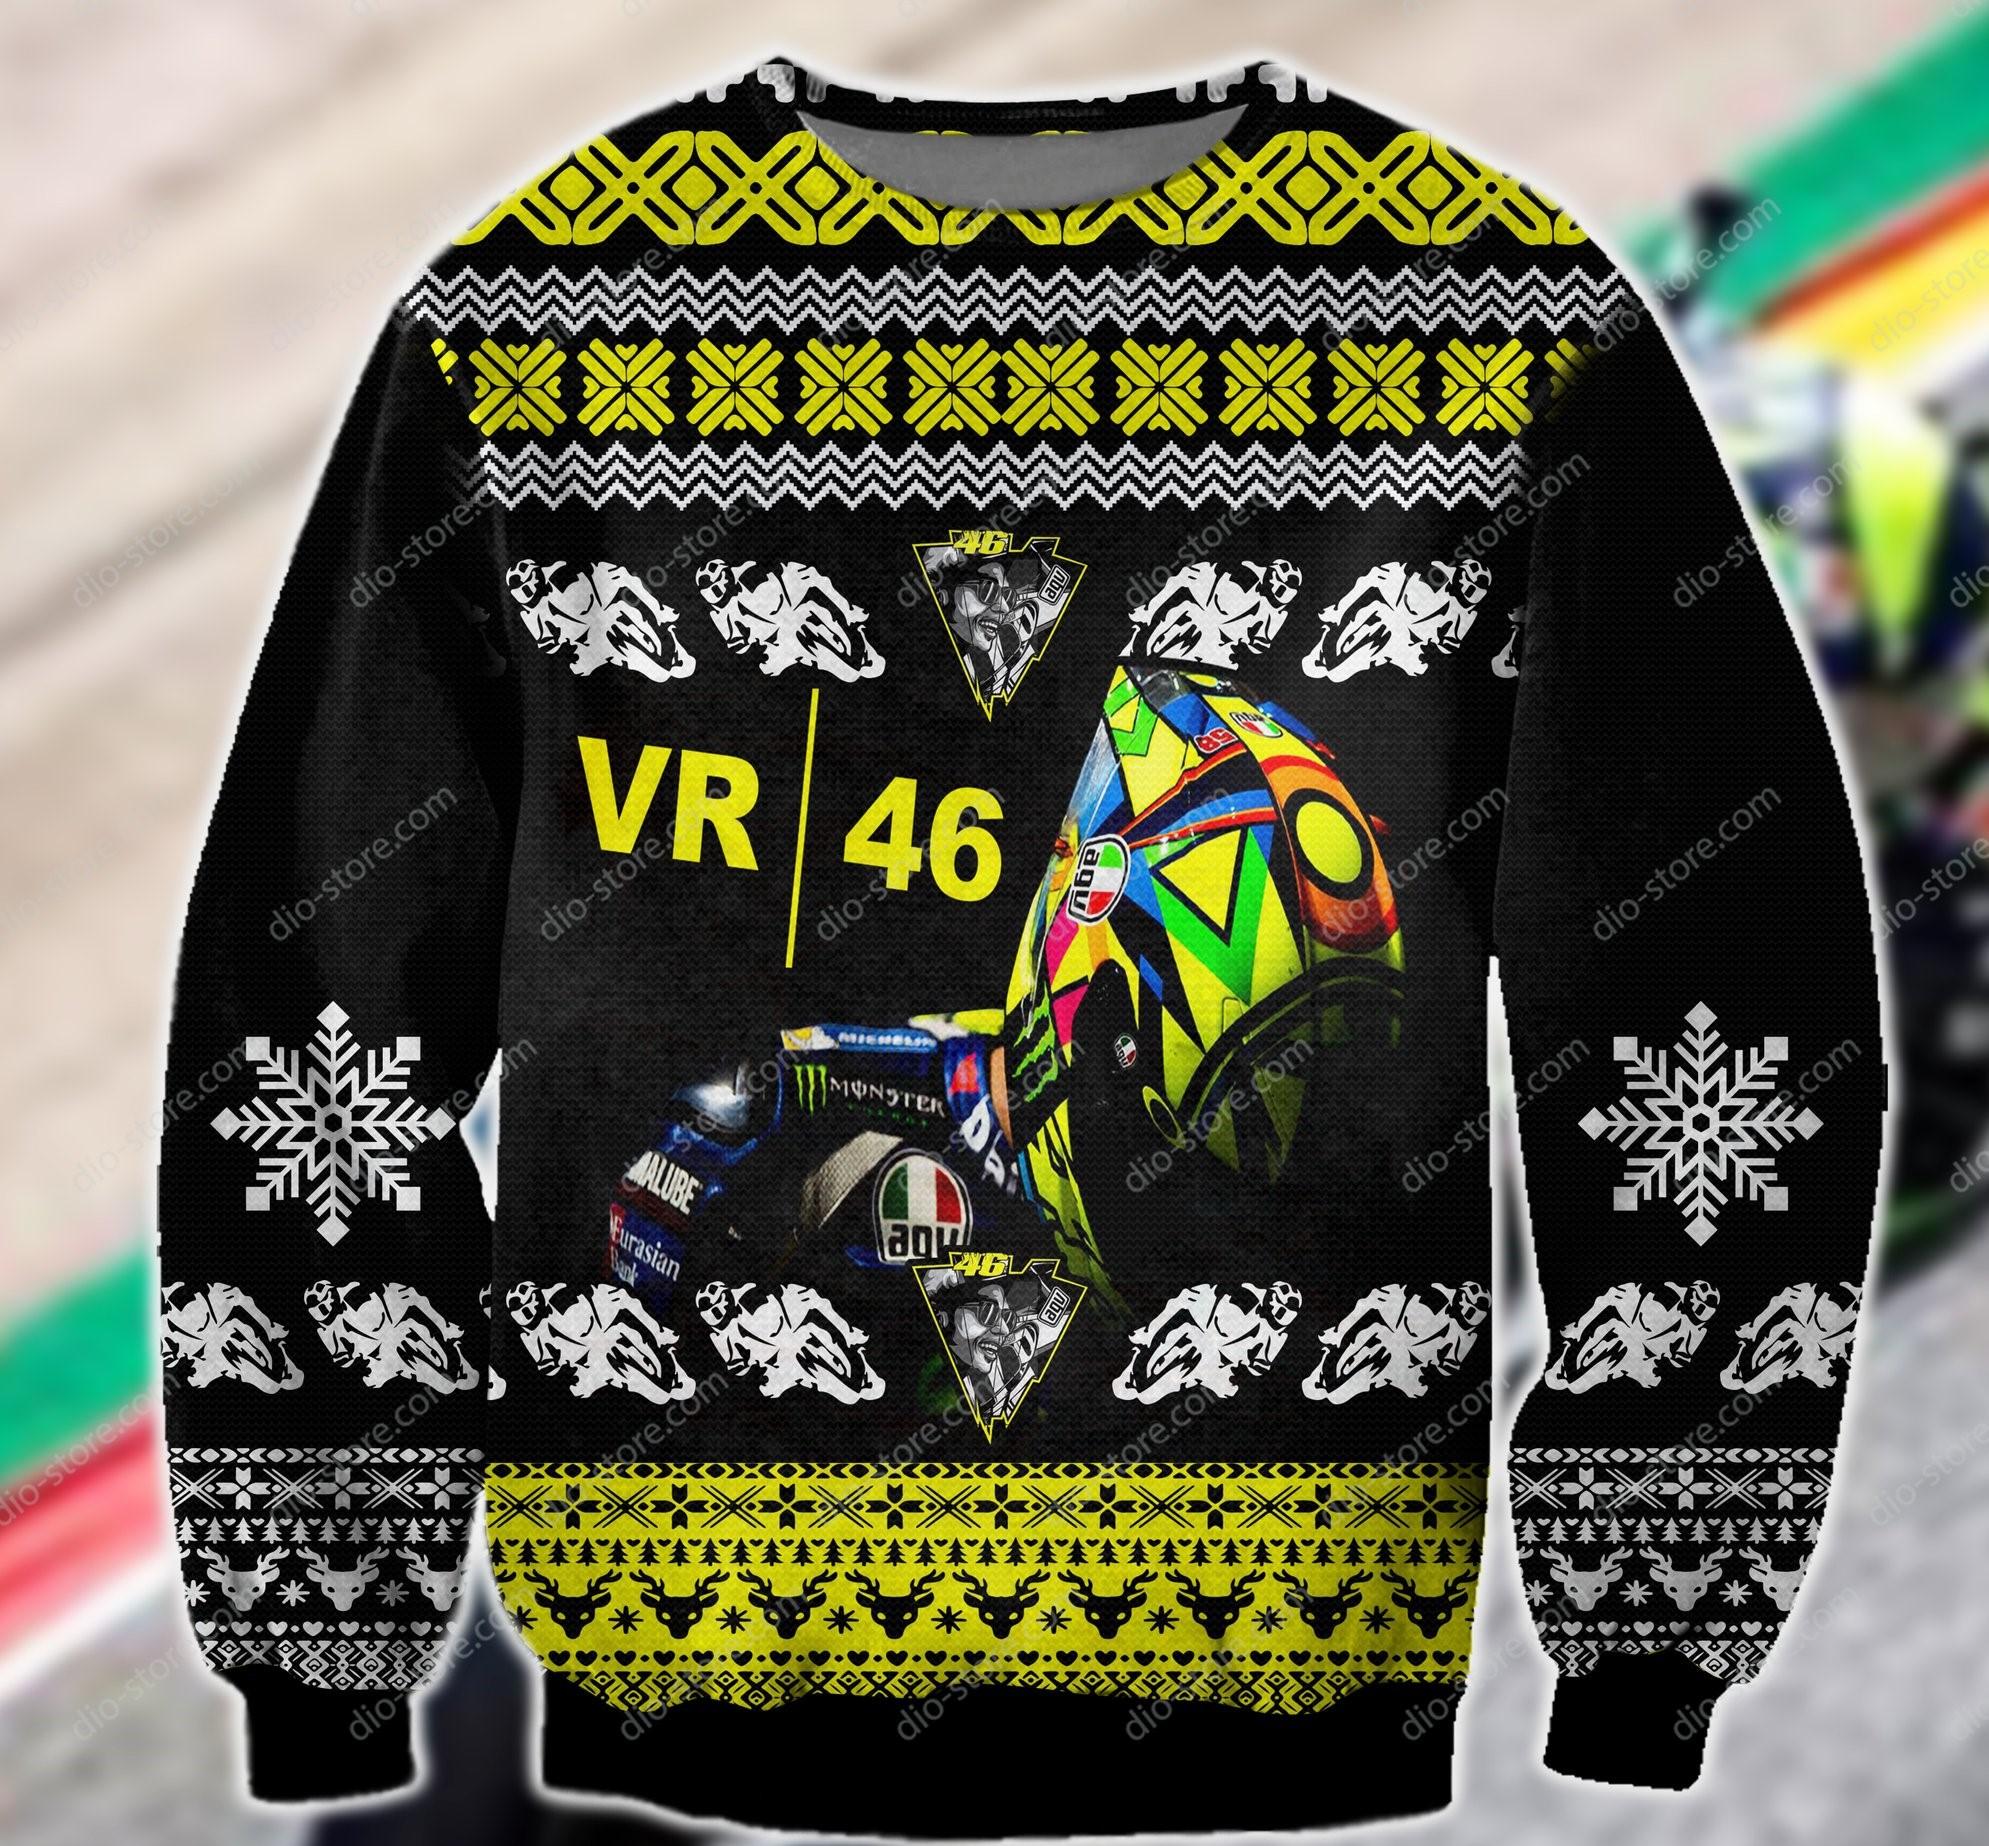 sky racing vr46 all over printed ugly christmas sweater 2 - Copy